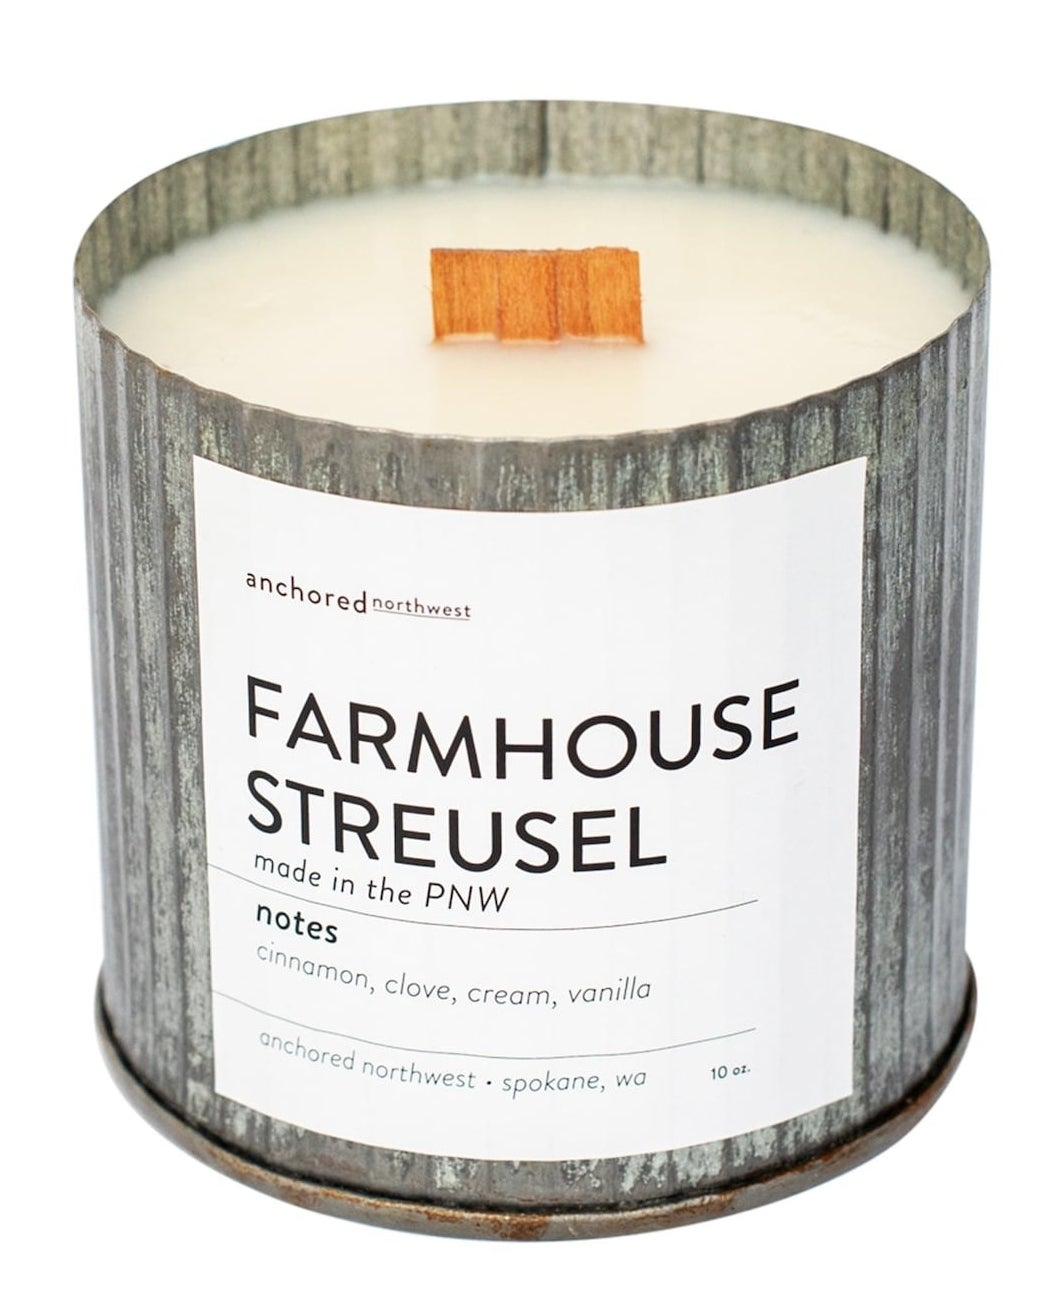 the farmhouse streusel candle